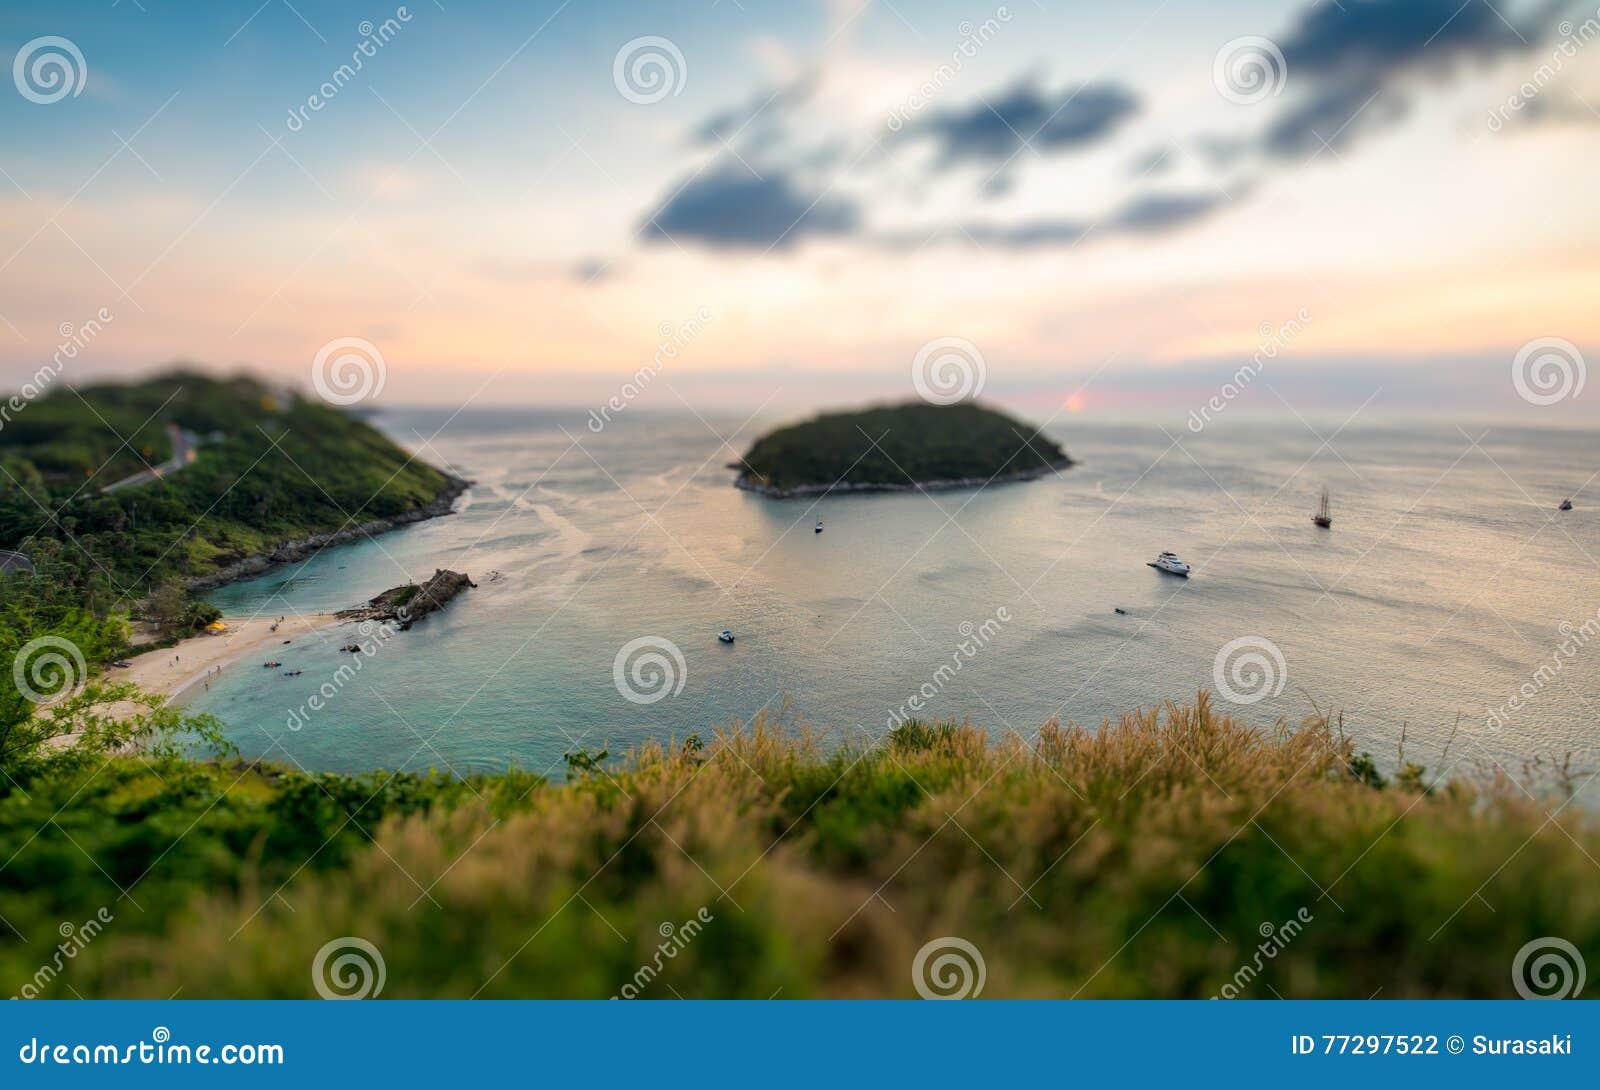 Перенос наклона тропического ландшафта океана с маленьким островом